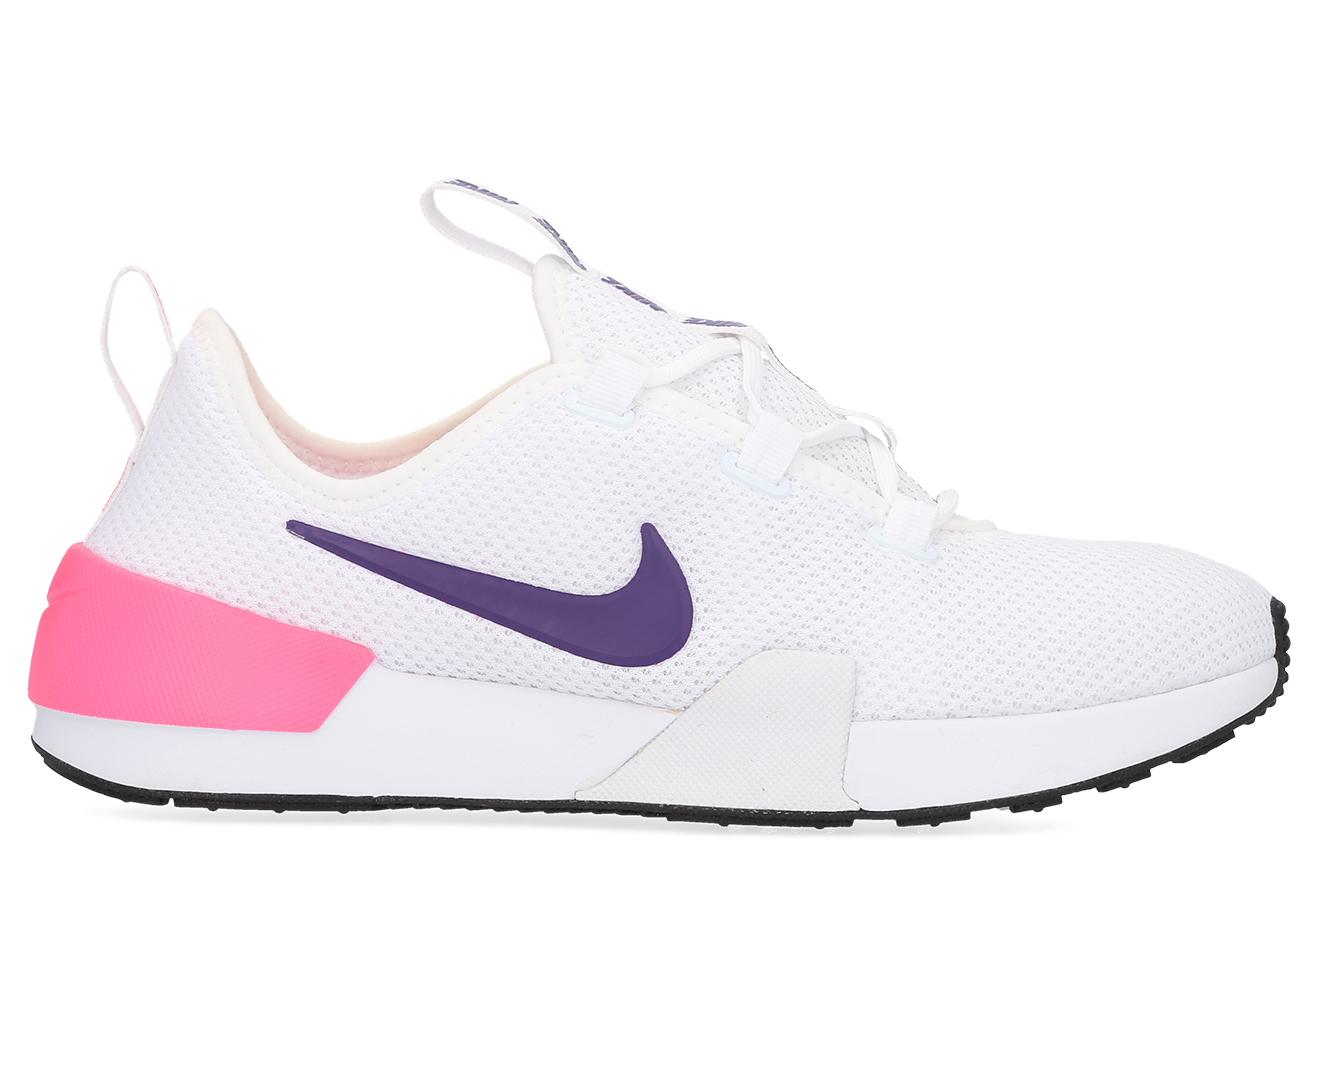 Cena fabryczna style mody ponadczasowy design Details about Nike Women's Ashin Modern Shoe - White/Court Purple/Laser Pink